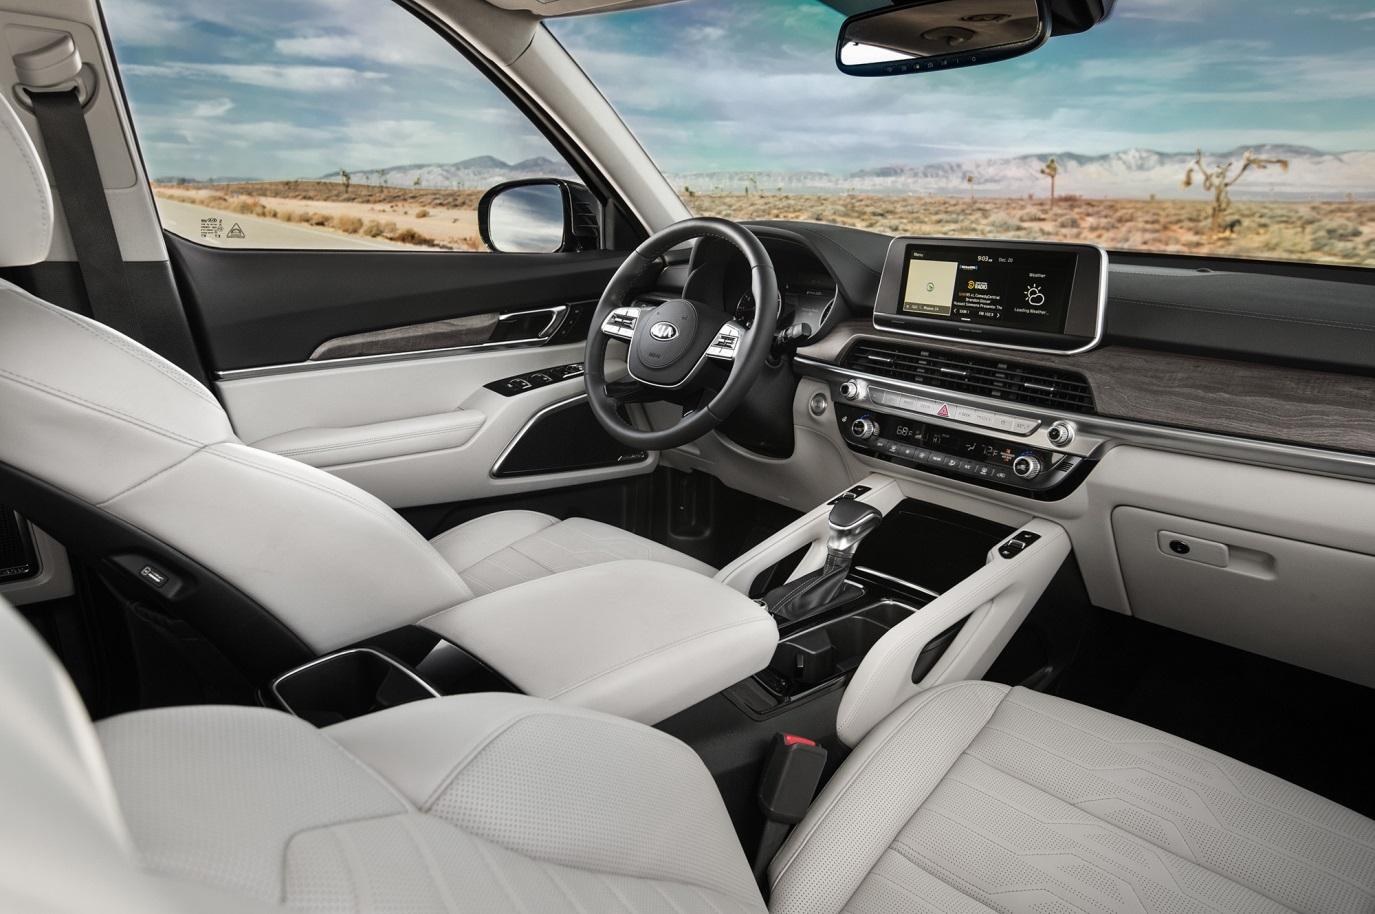 C:\Users\Jialing\Desktop\20190227\634-Car Guide\Telluride-half\5c3d8984ec05c492540000e3.jpg